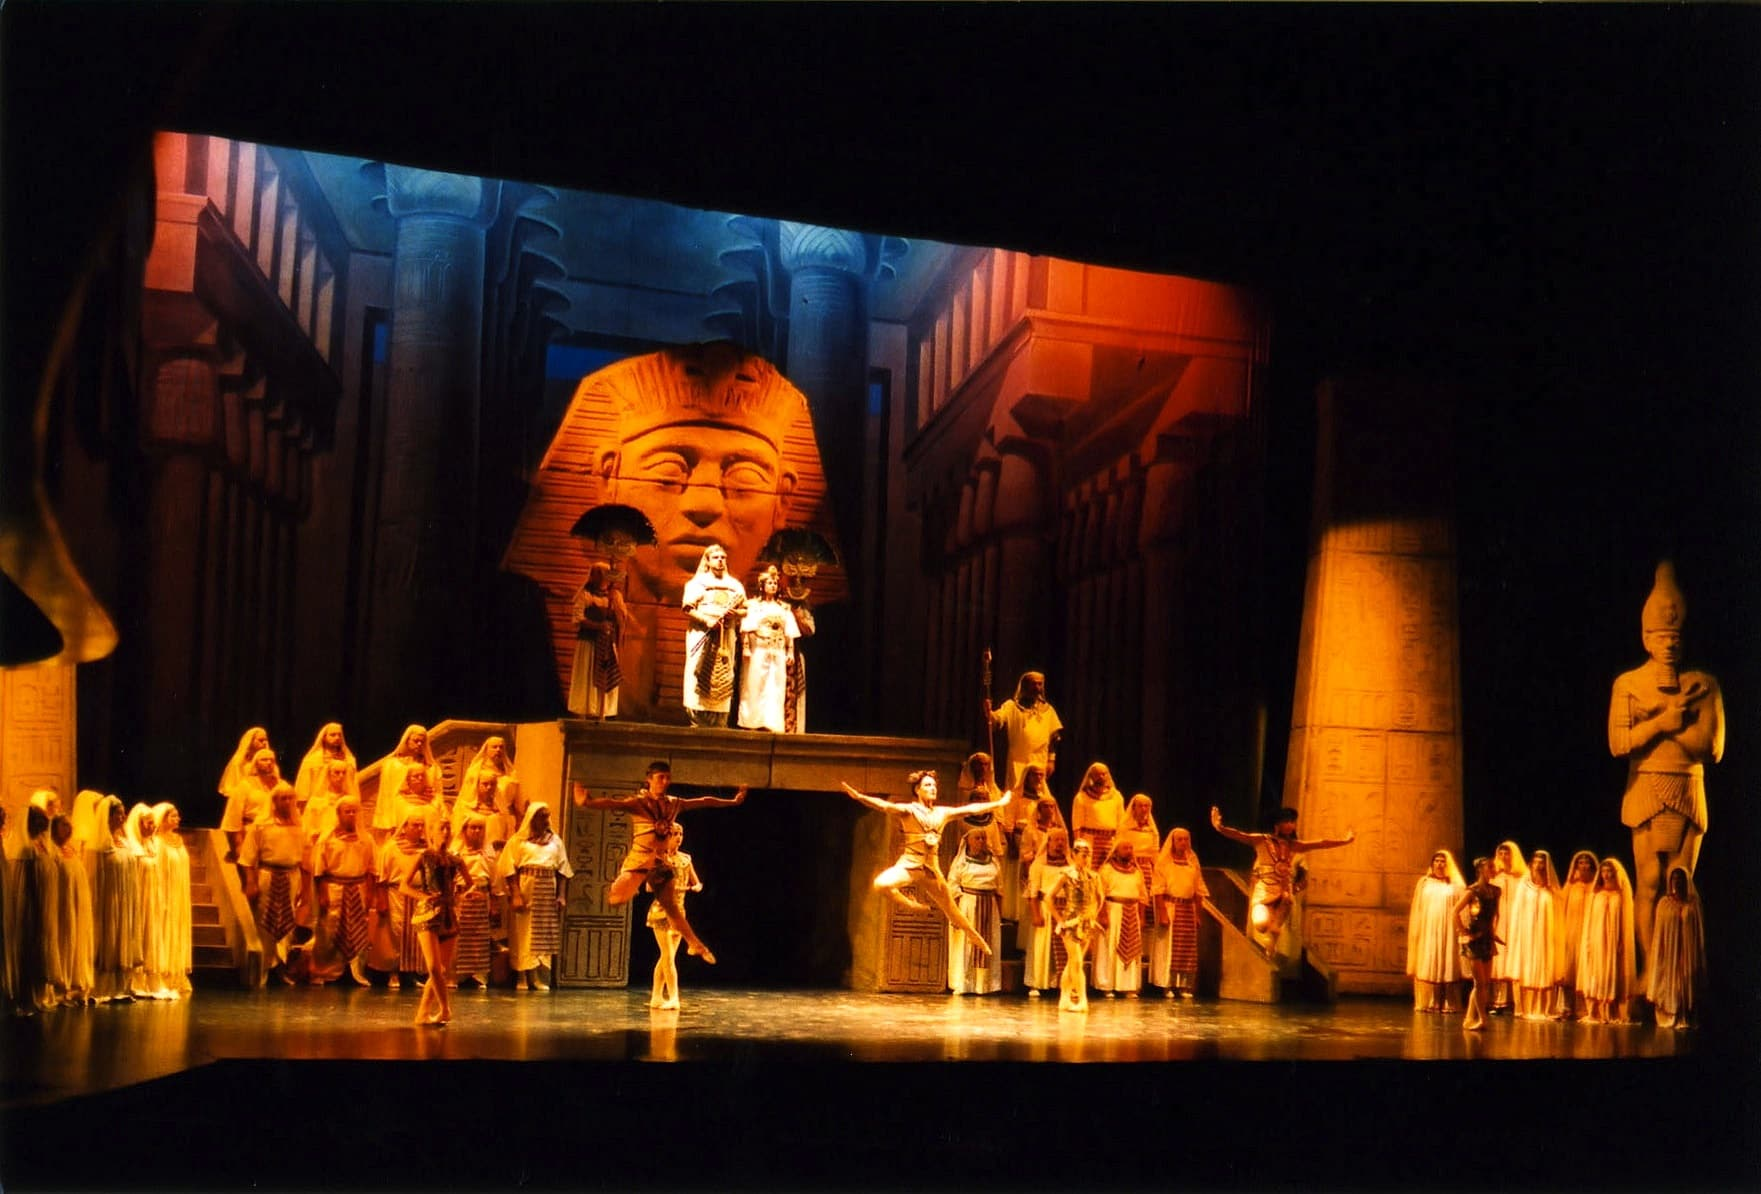 Verdi's AIDA - TEATRO LIRICO' S AIDA RIGHT TO THE LAST DETAIL!